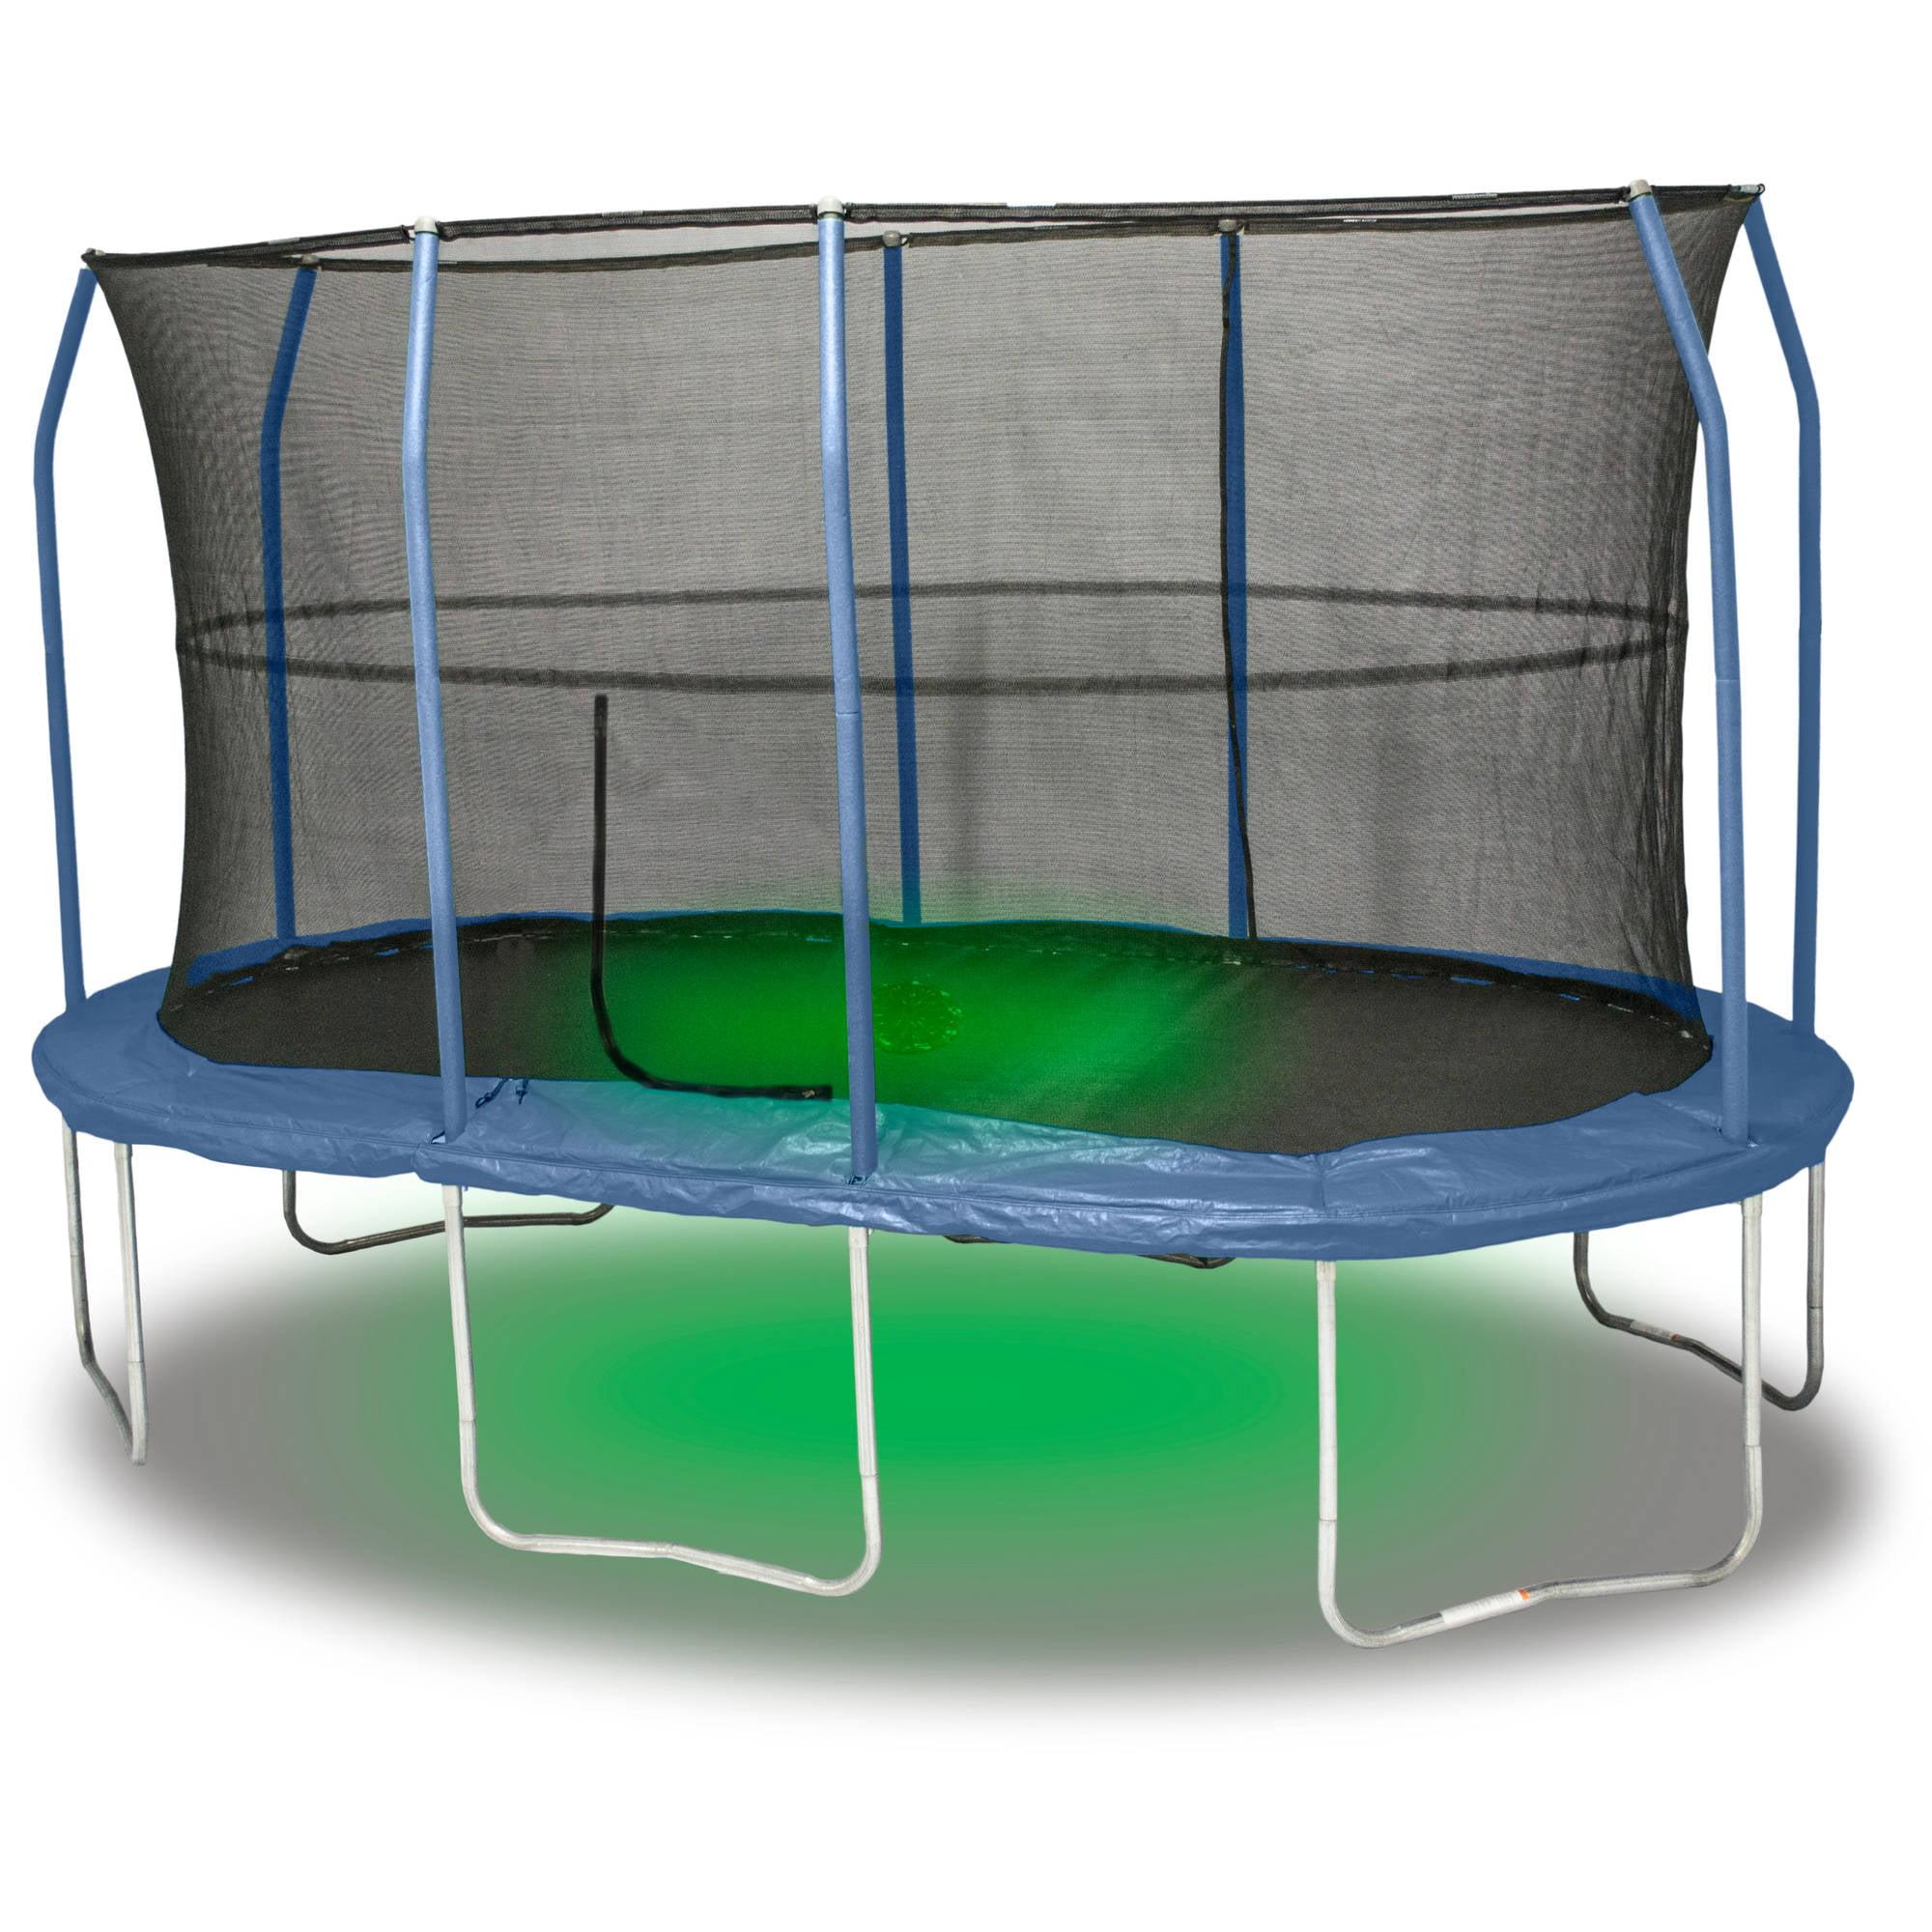 jumpking 15u0027 x 17u0027 oval trampoline combo with sound and light box 2 of 2 walmartcom